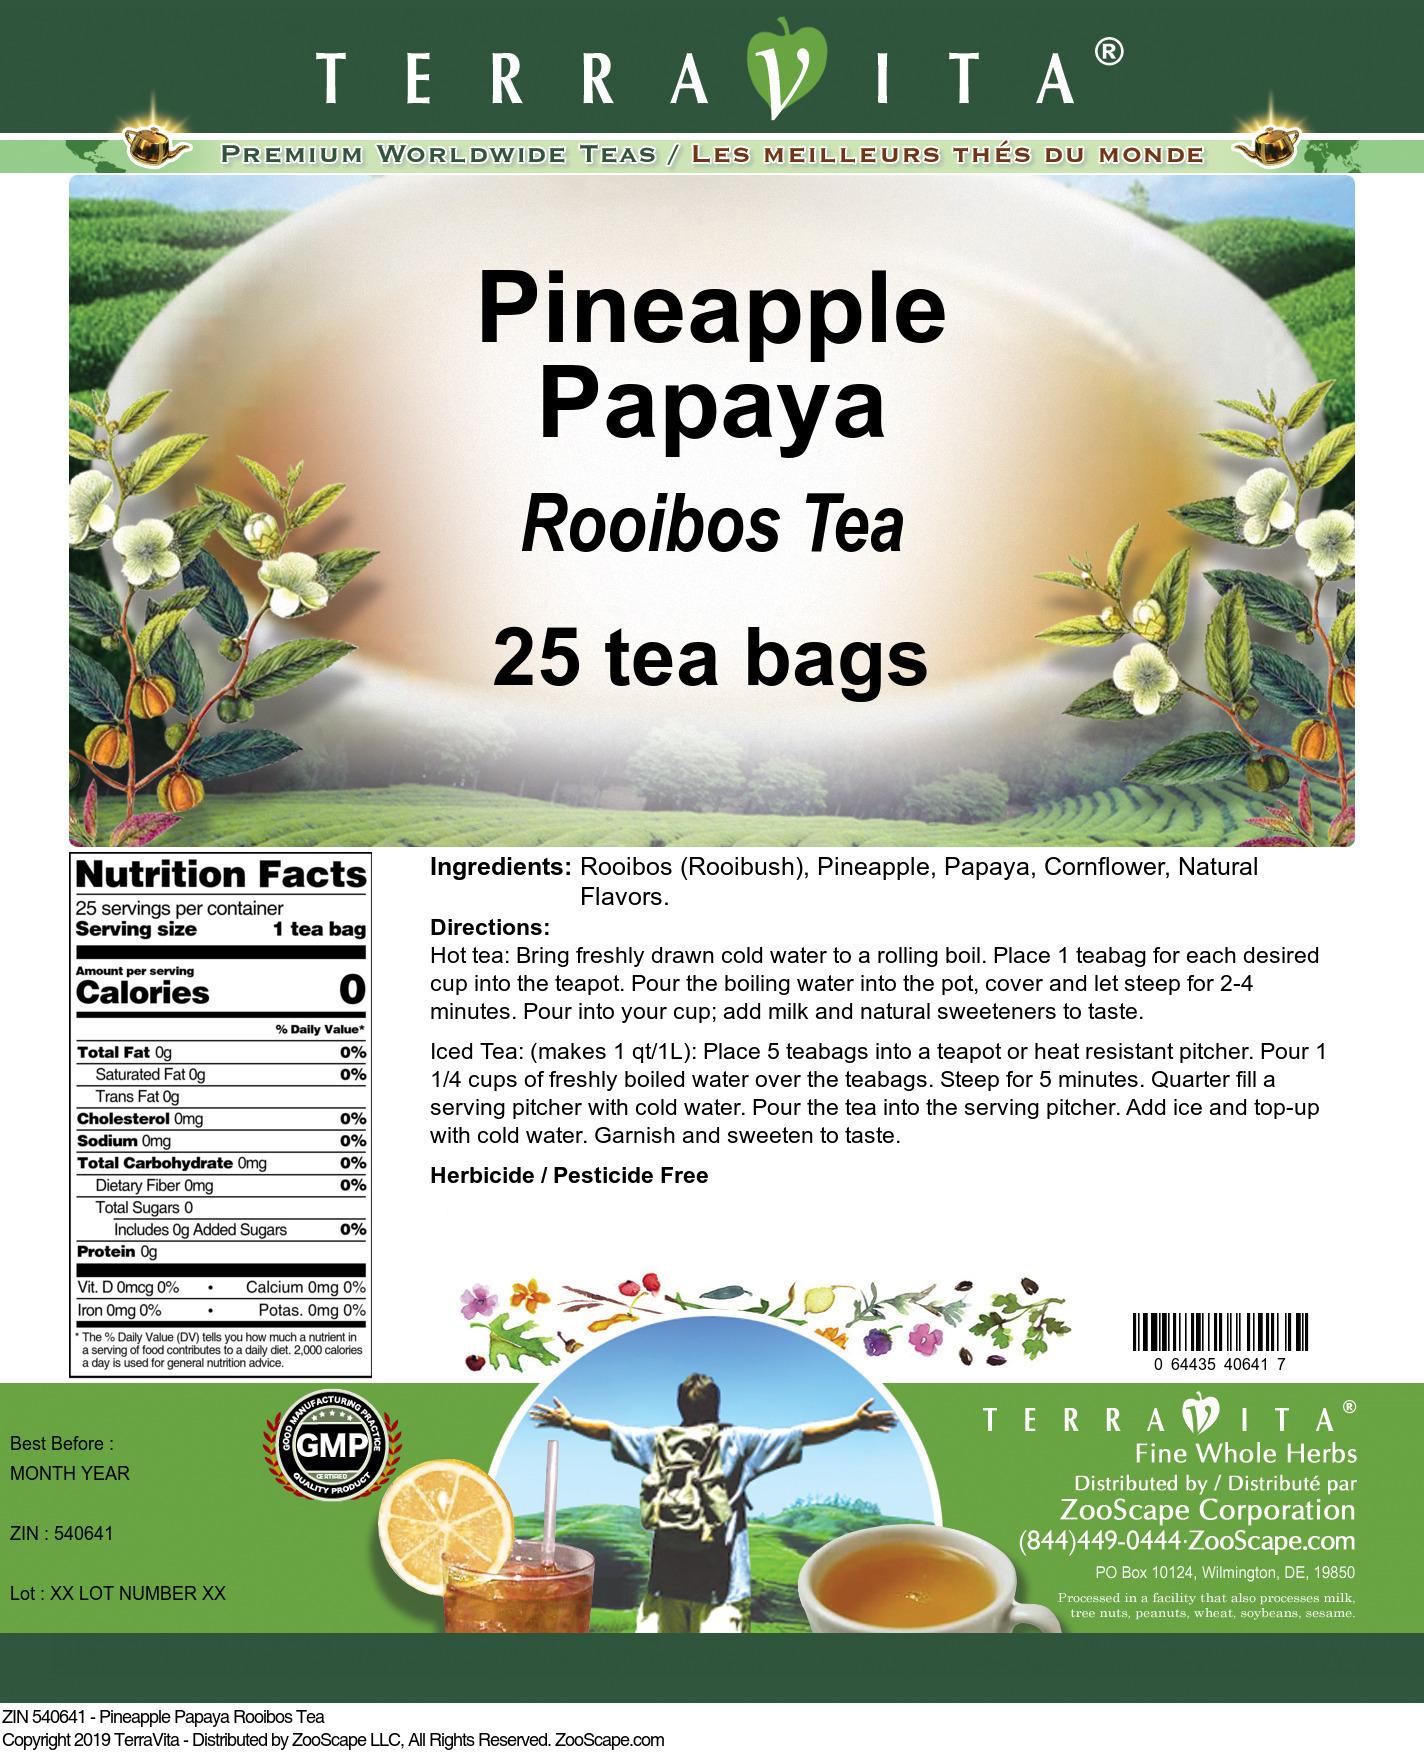 Pineapple Papaya Rooibos Tea